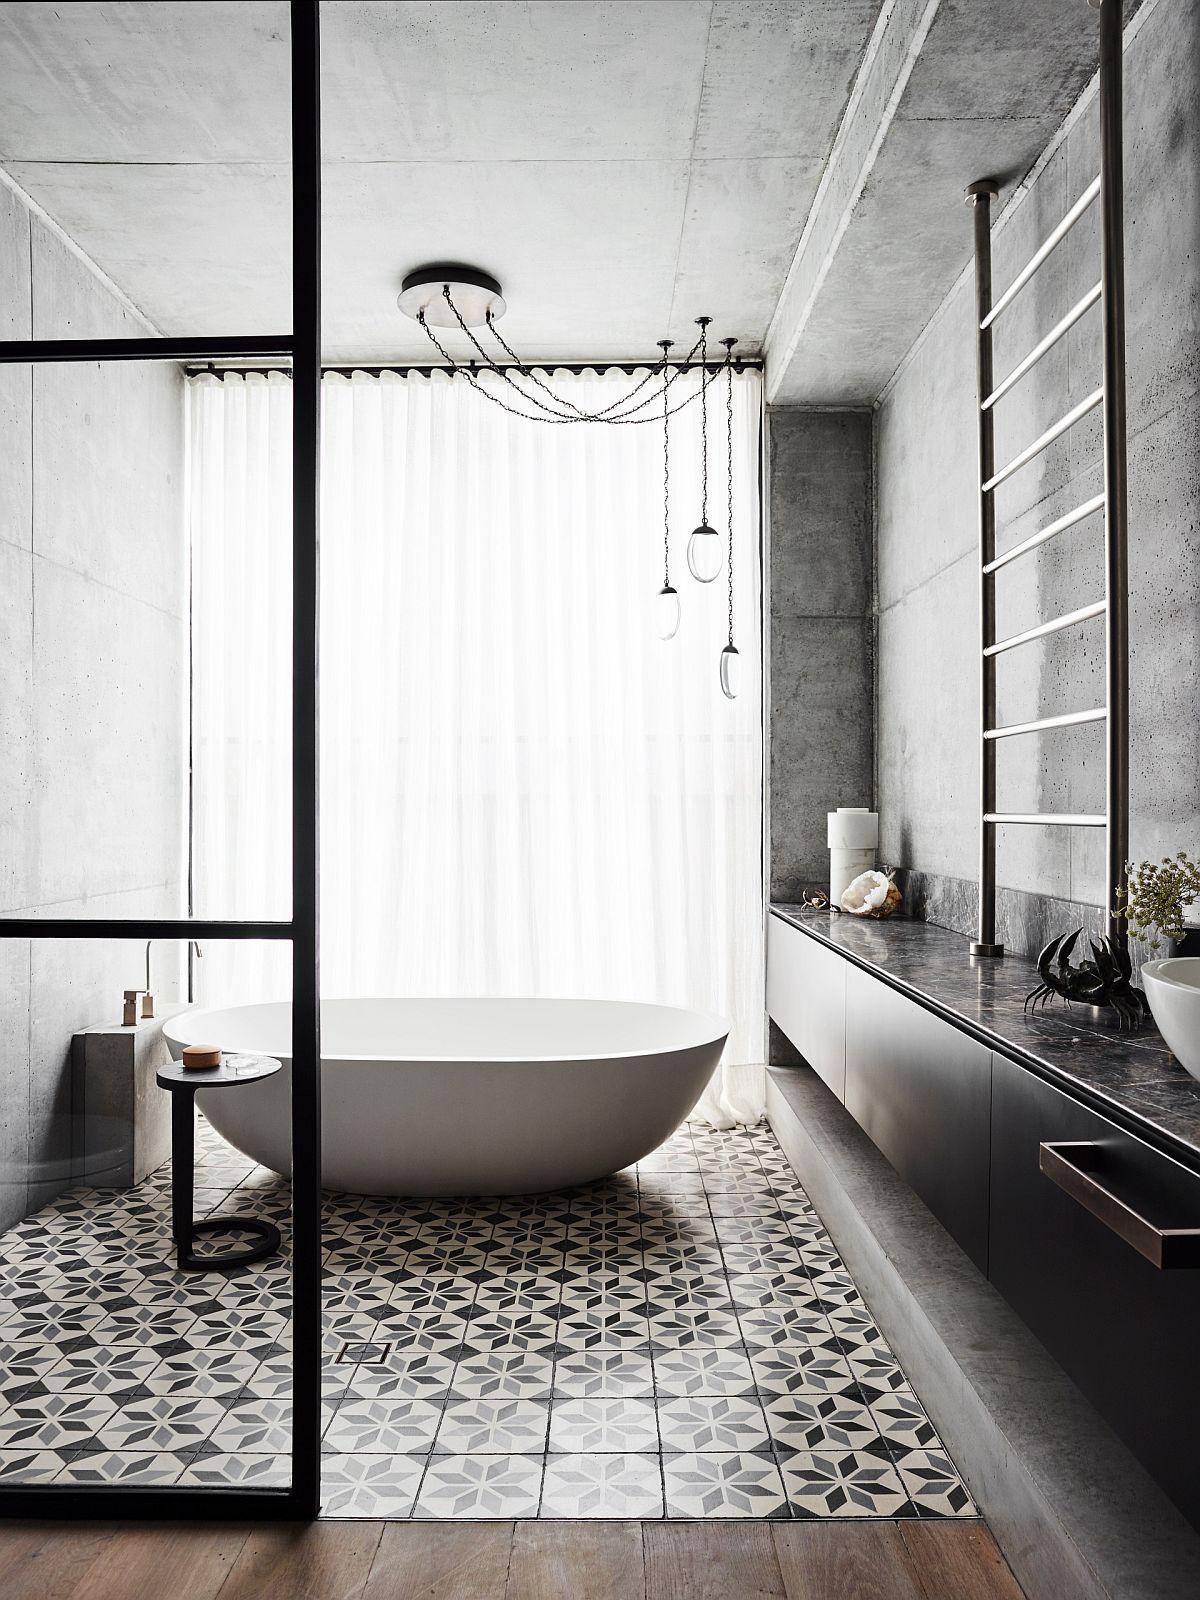 Modern minimal bathroom with industrial flair and a polished freestanding bathtub